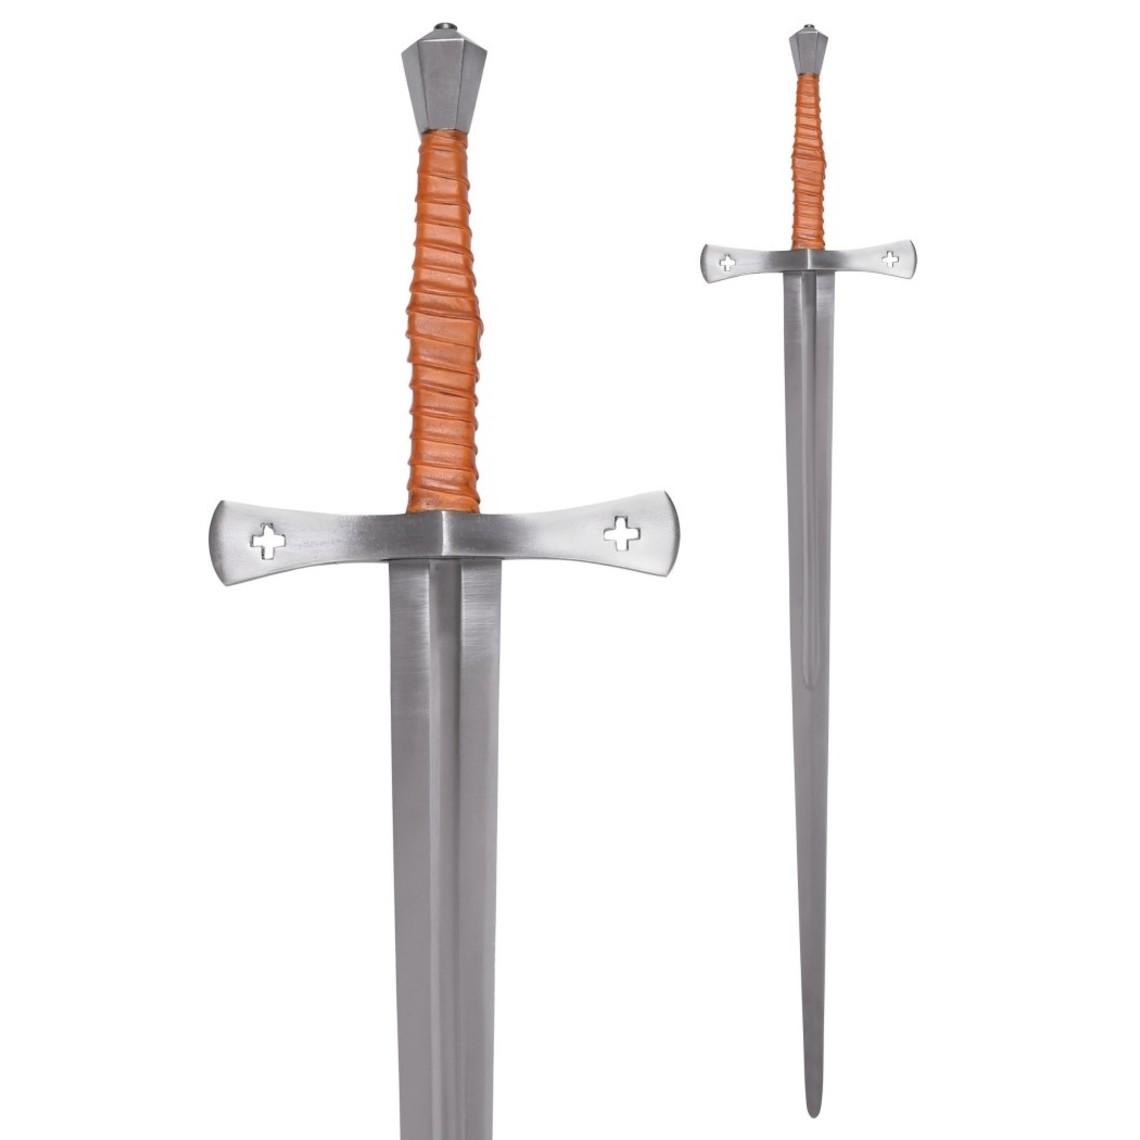 Deepeeka Espada de mano y media del siglo XV Shrewsbury, battle-ready